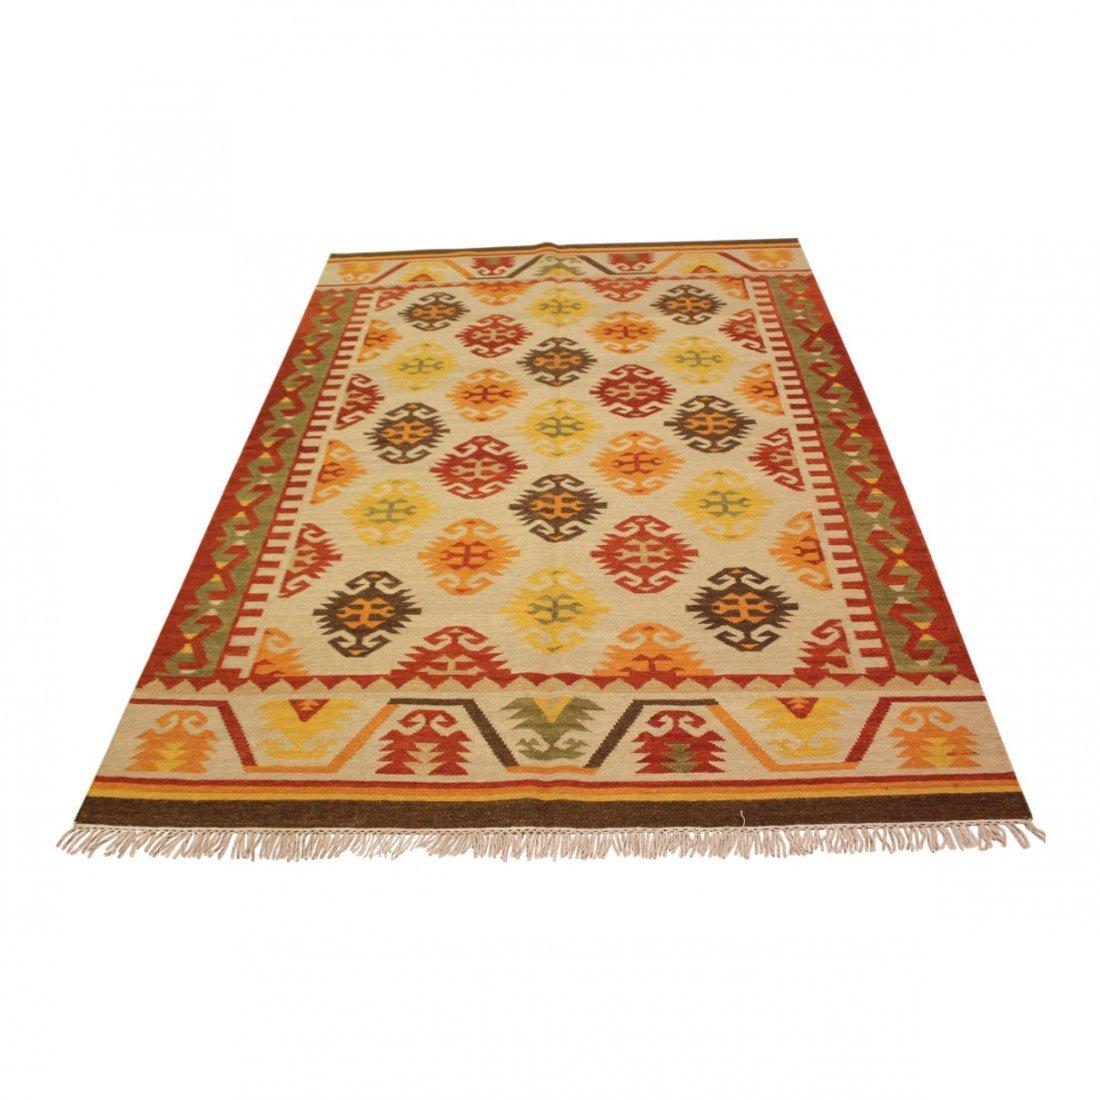 Shirvan Flatweave Handmade Kilim Rug 5.3x7.7